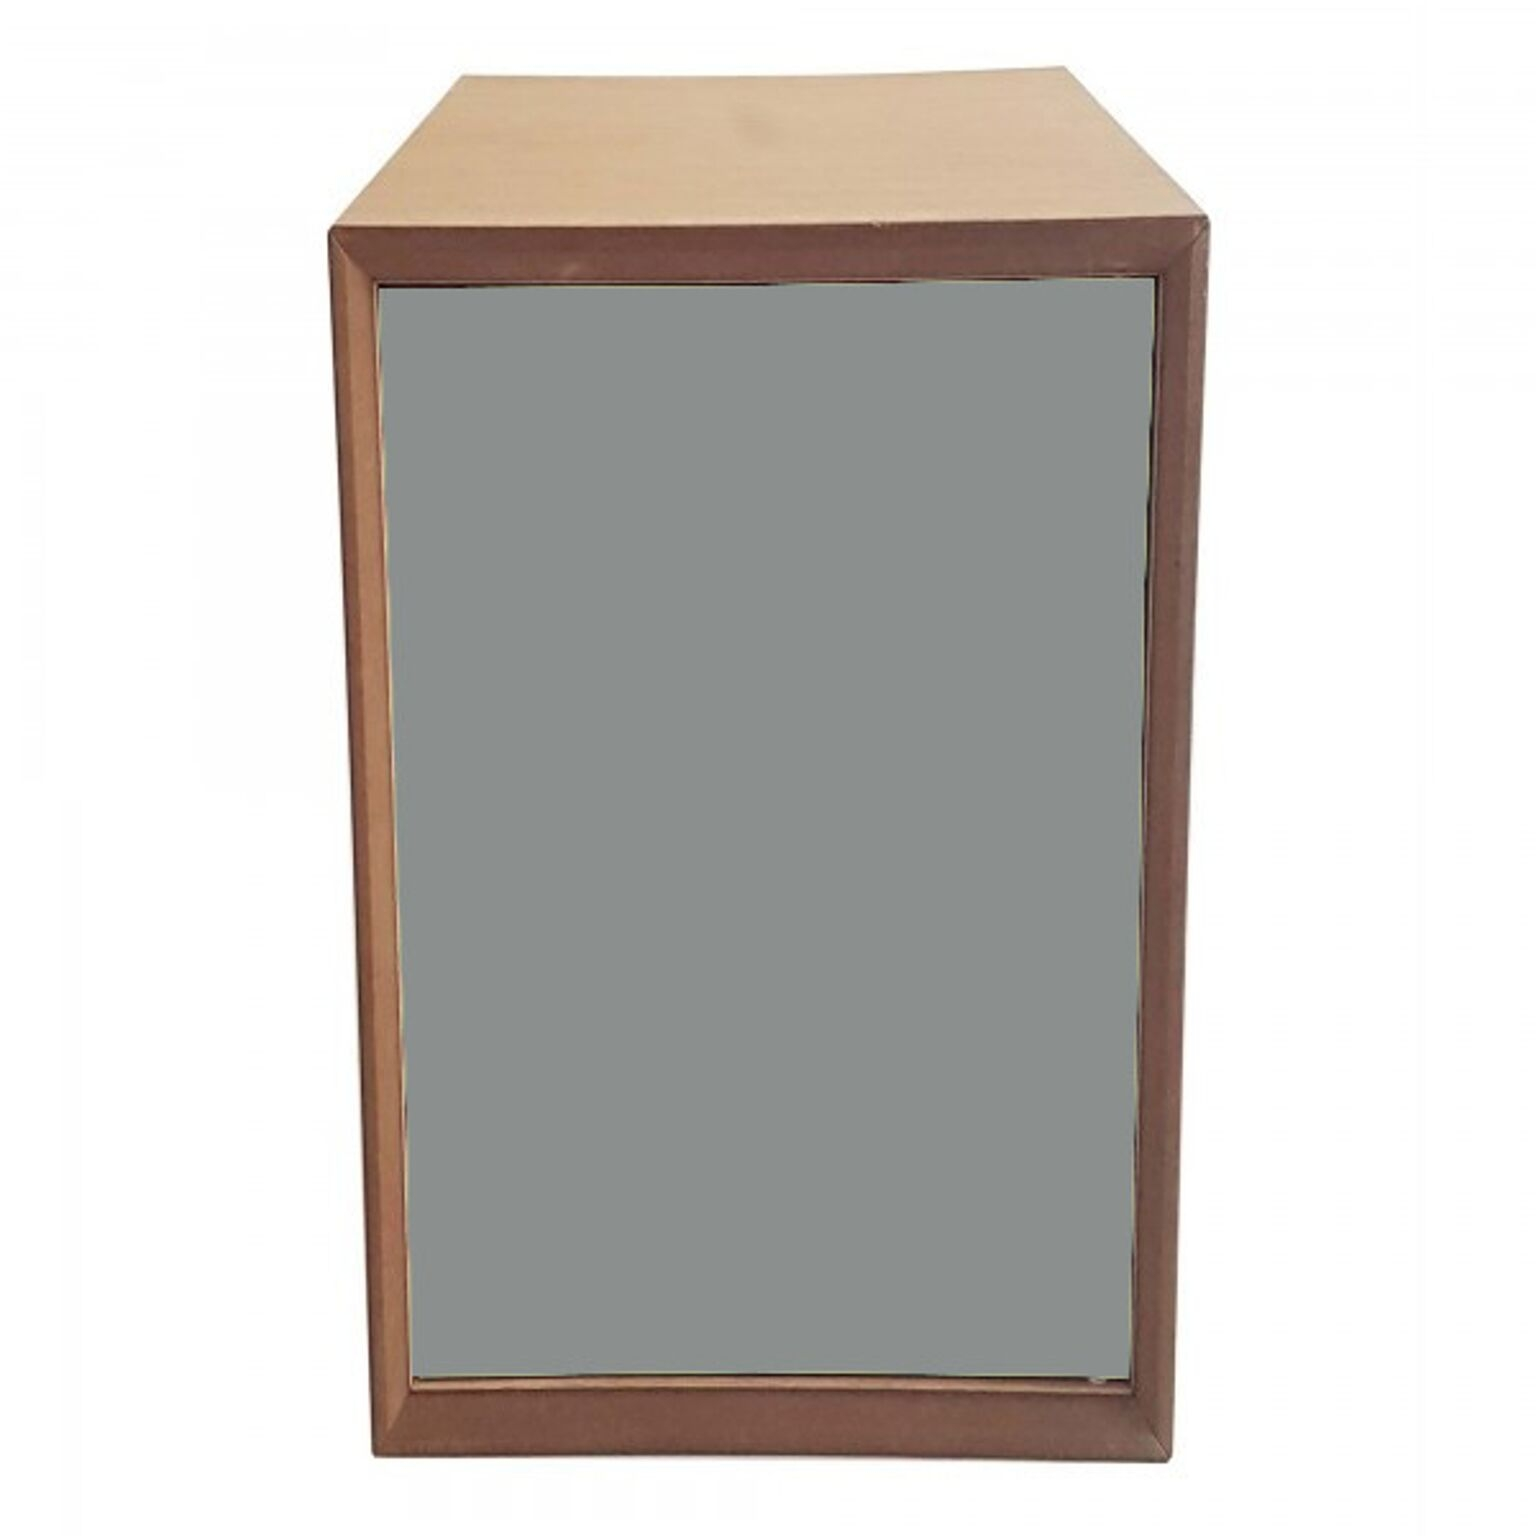 Dulap modular Pixel Dark Grey / Wooden l40xA40xH80 cm